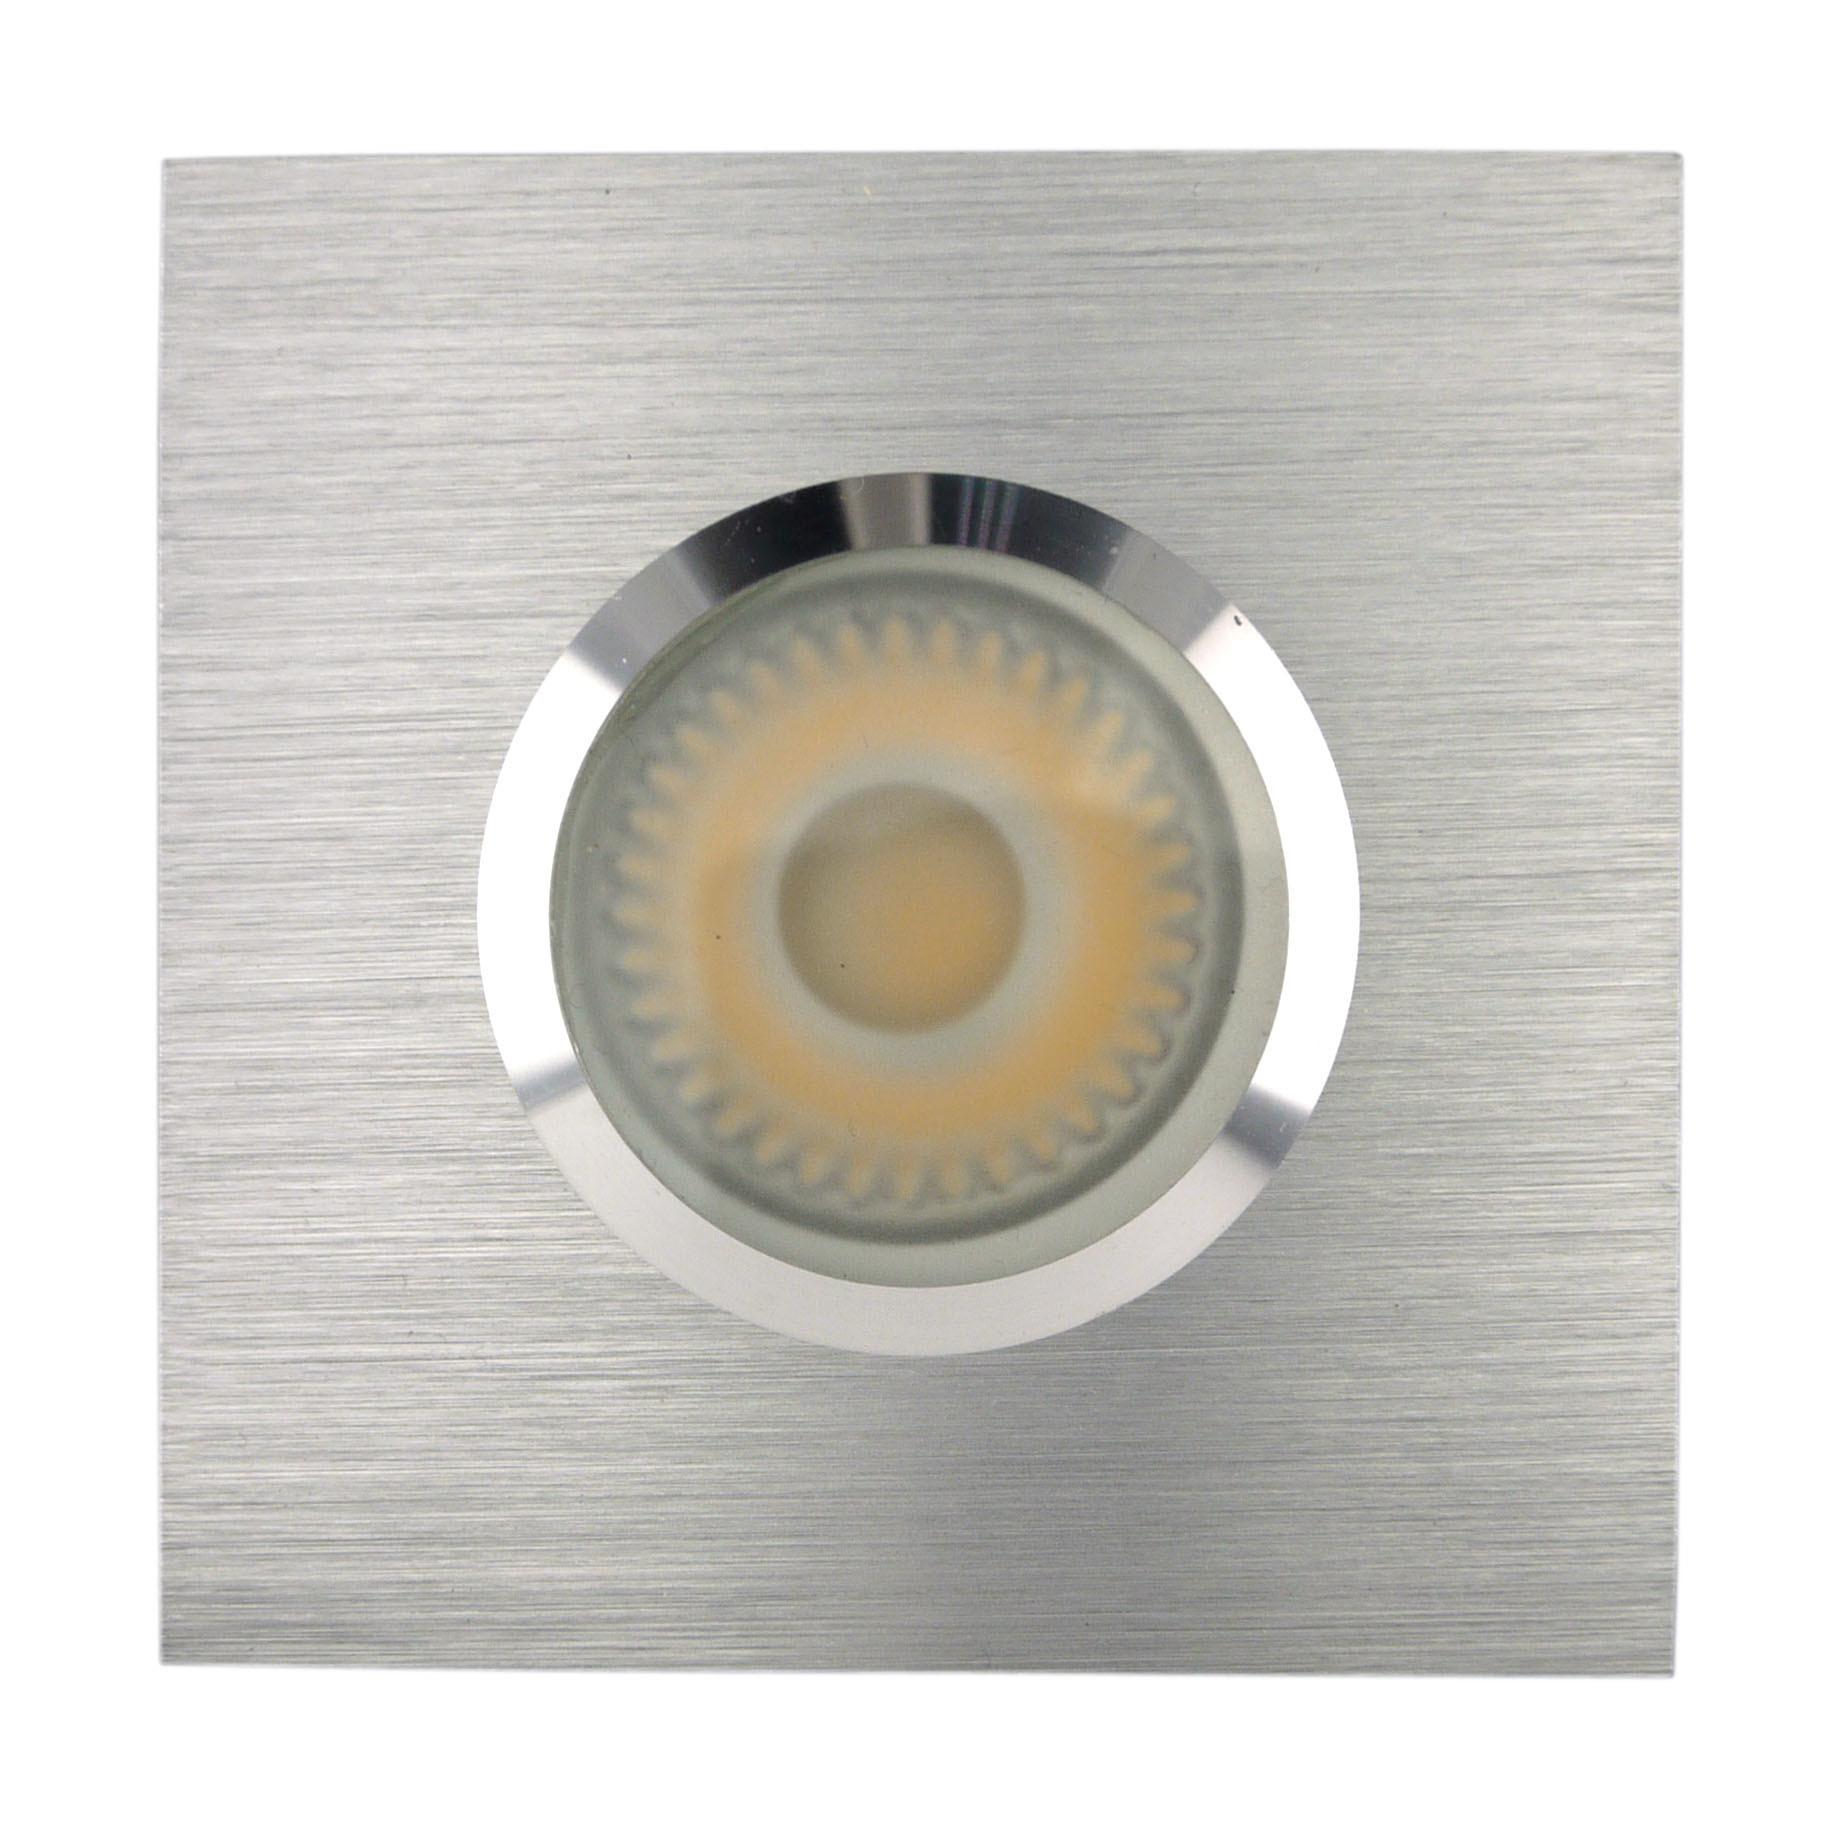 China lathe aluminum gu10 mr16 square fixed recessed led bathroom downlight lt2901 china spotlight downlight